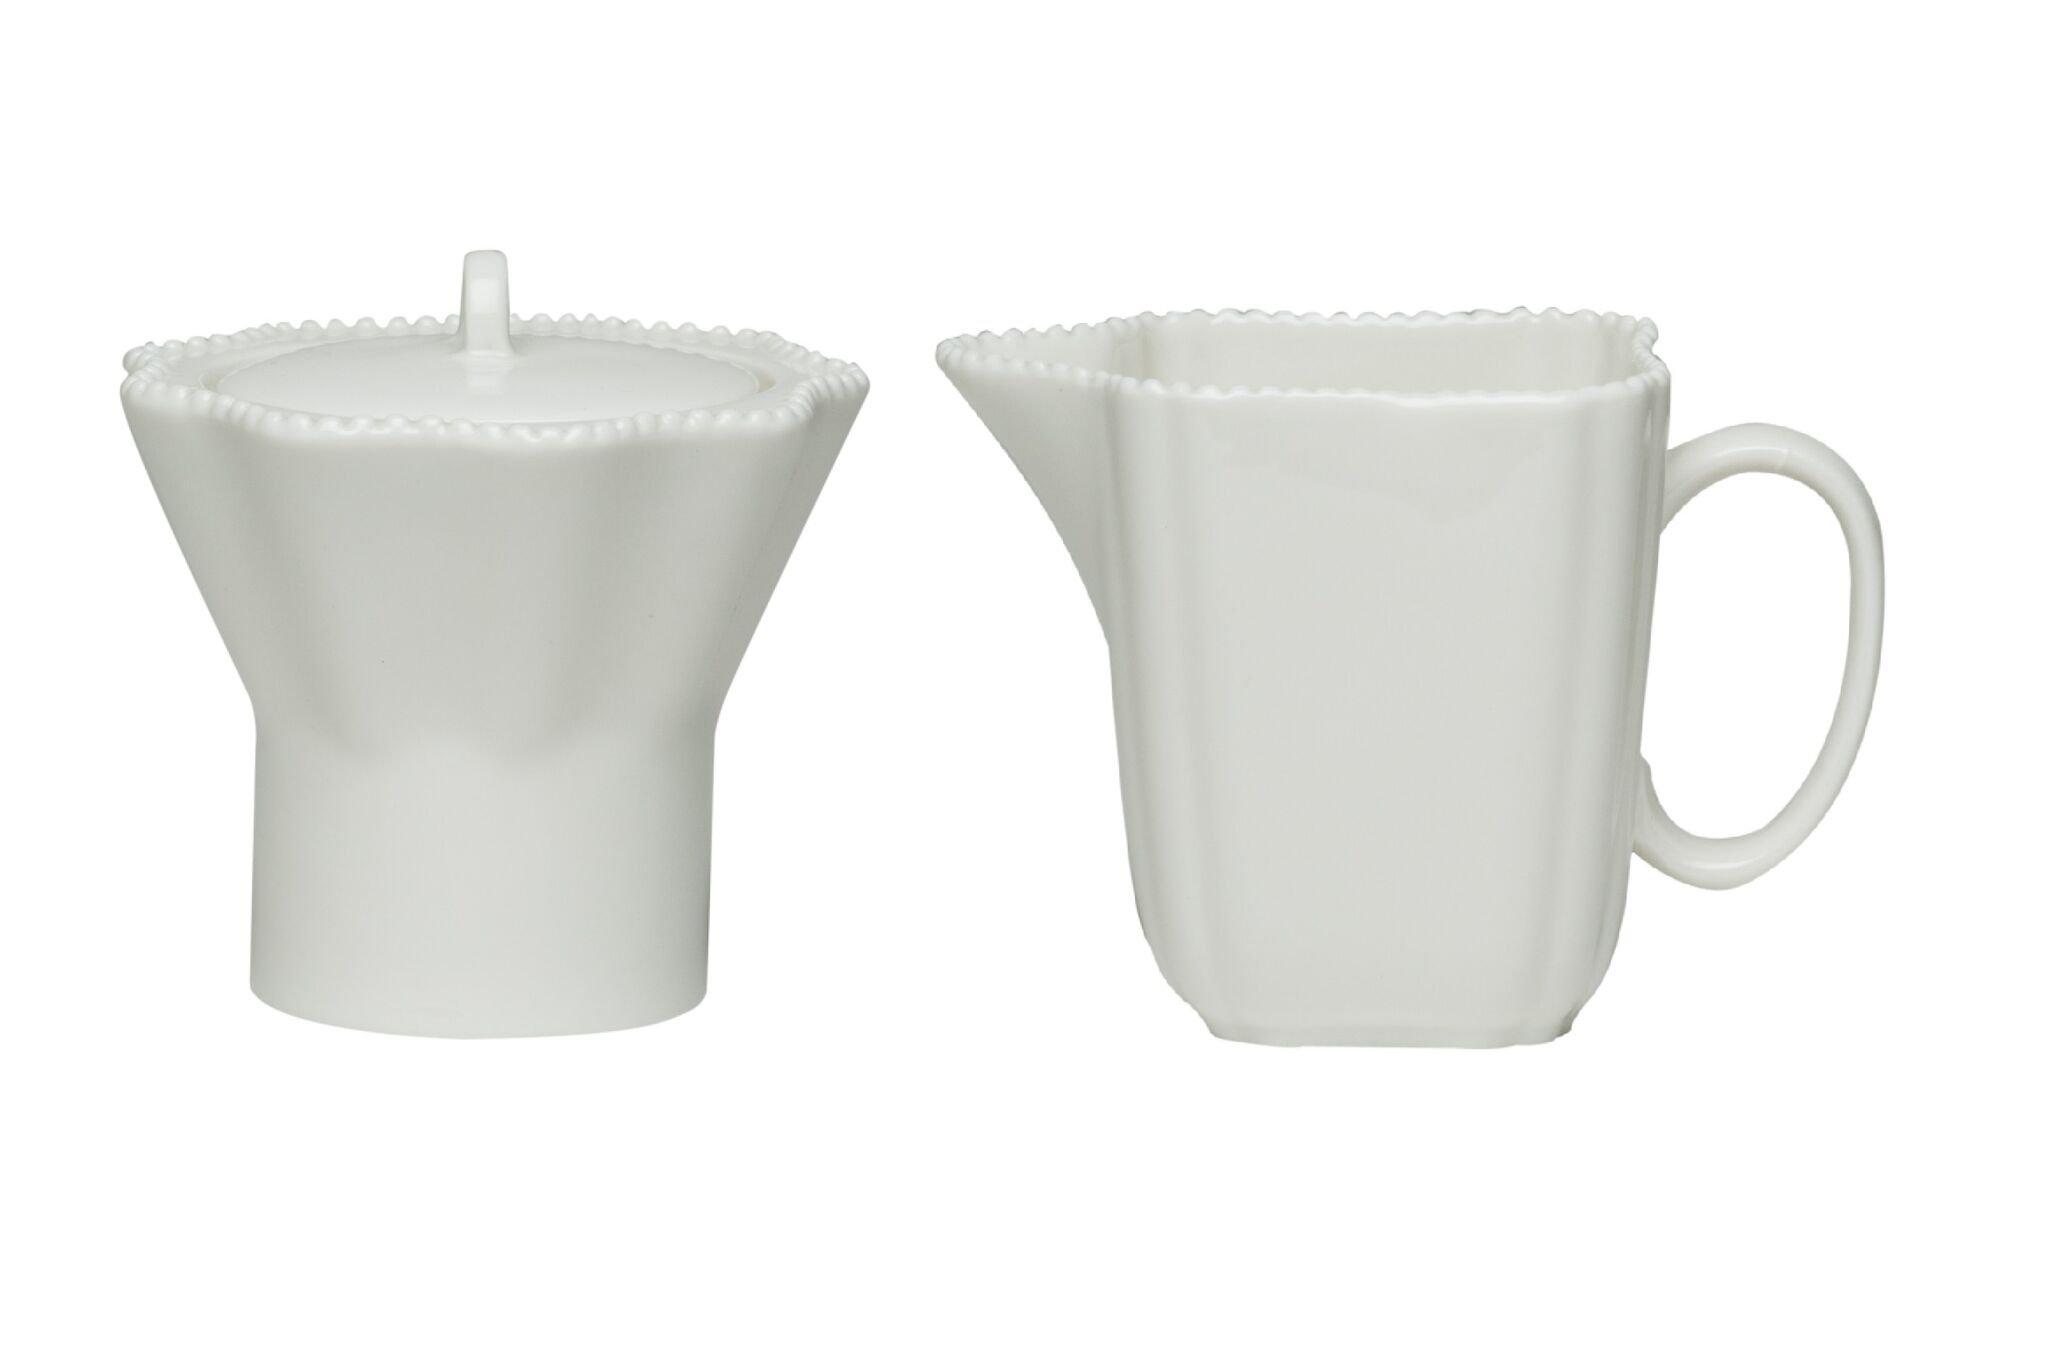 Red Vanilla Pinpoint Covered Sugar Bowl and Creamer Set